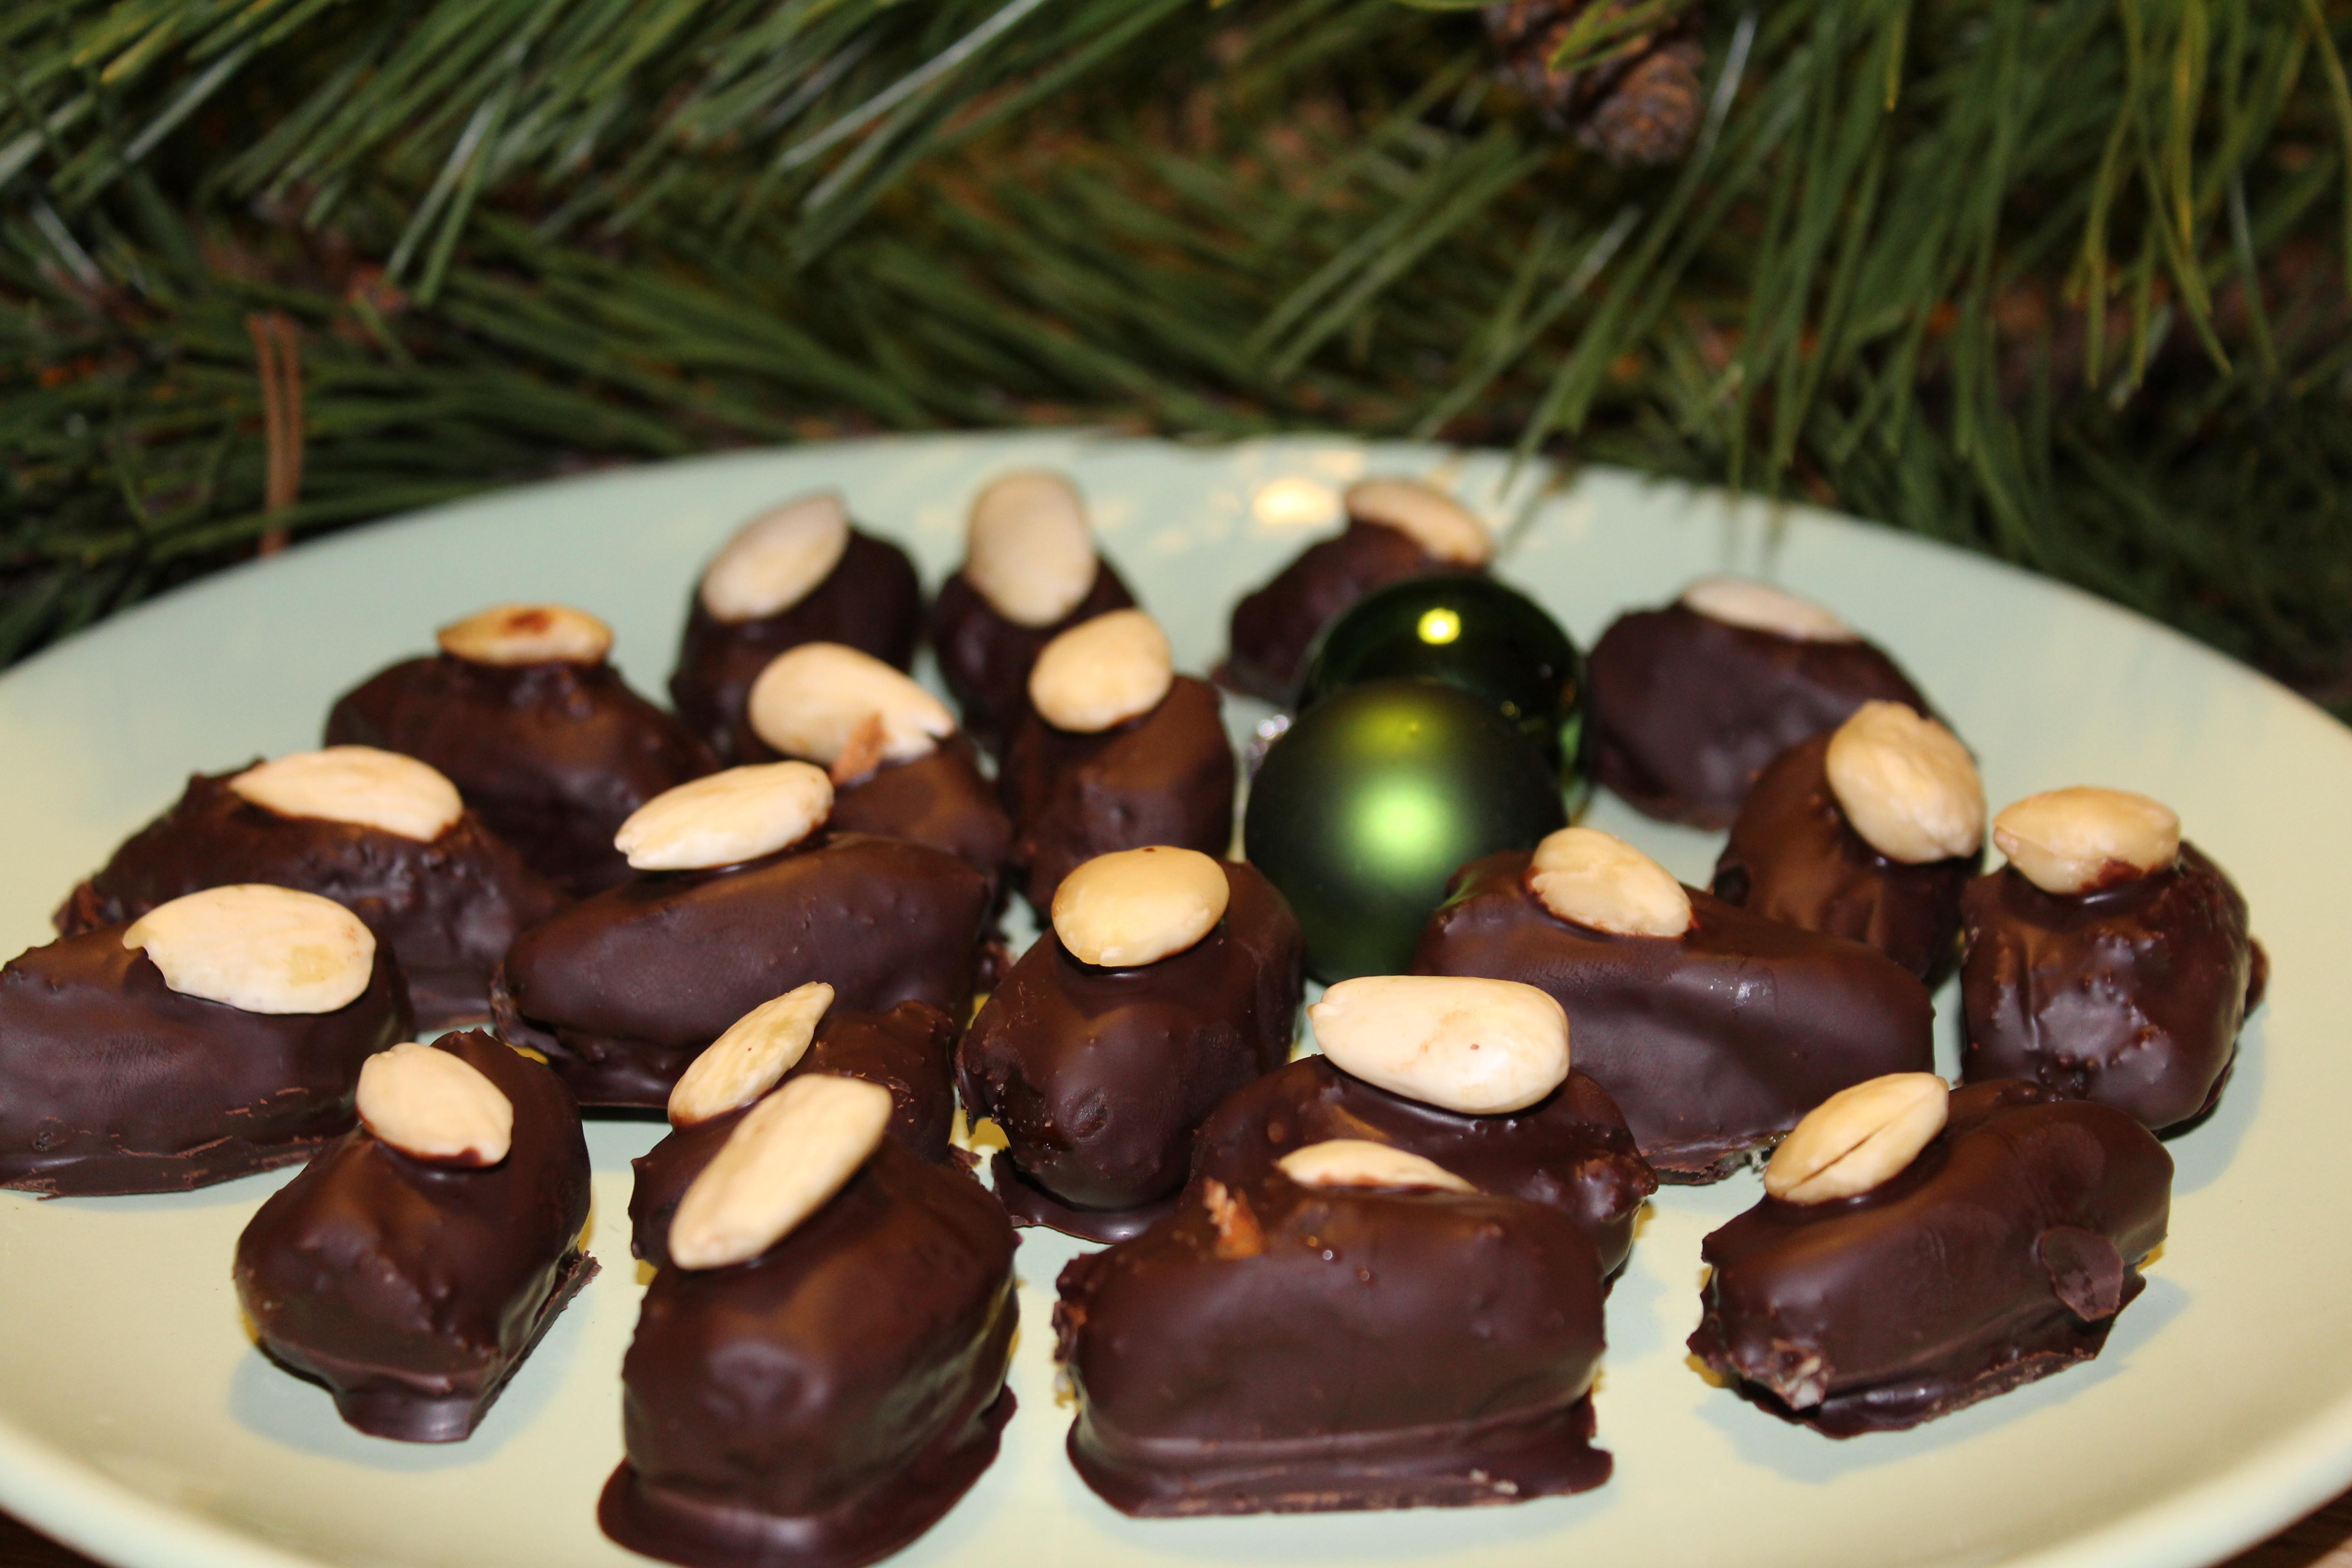 Dadler fyldt med chokolade og overtrukket med chokolade